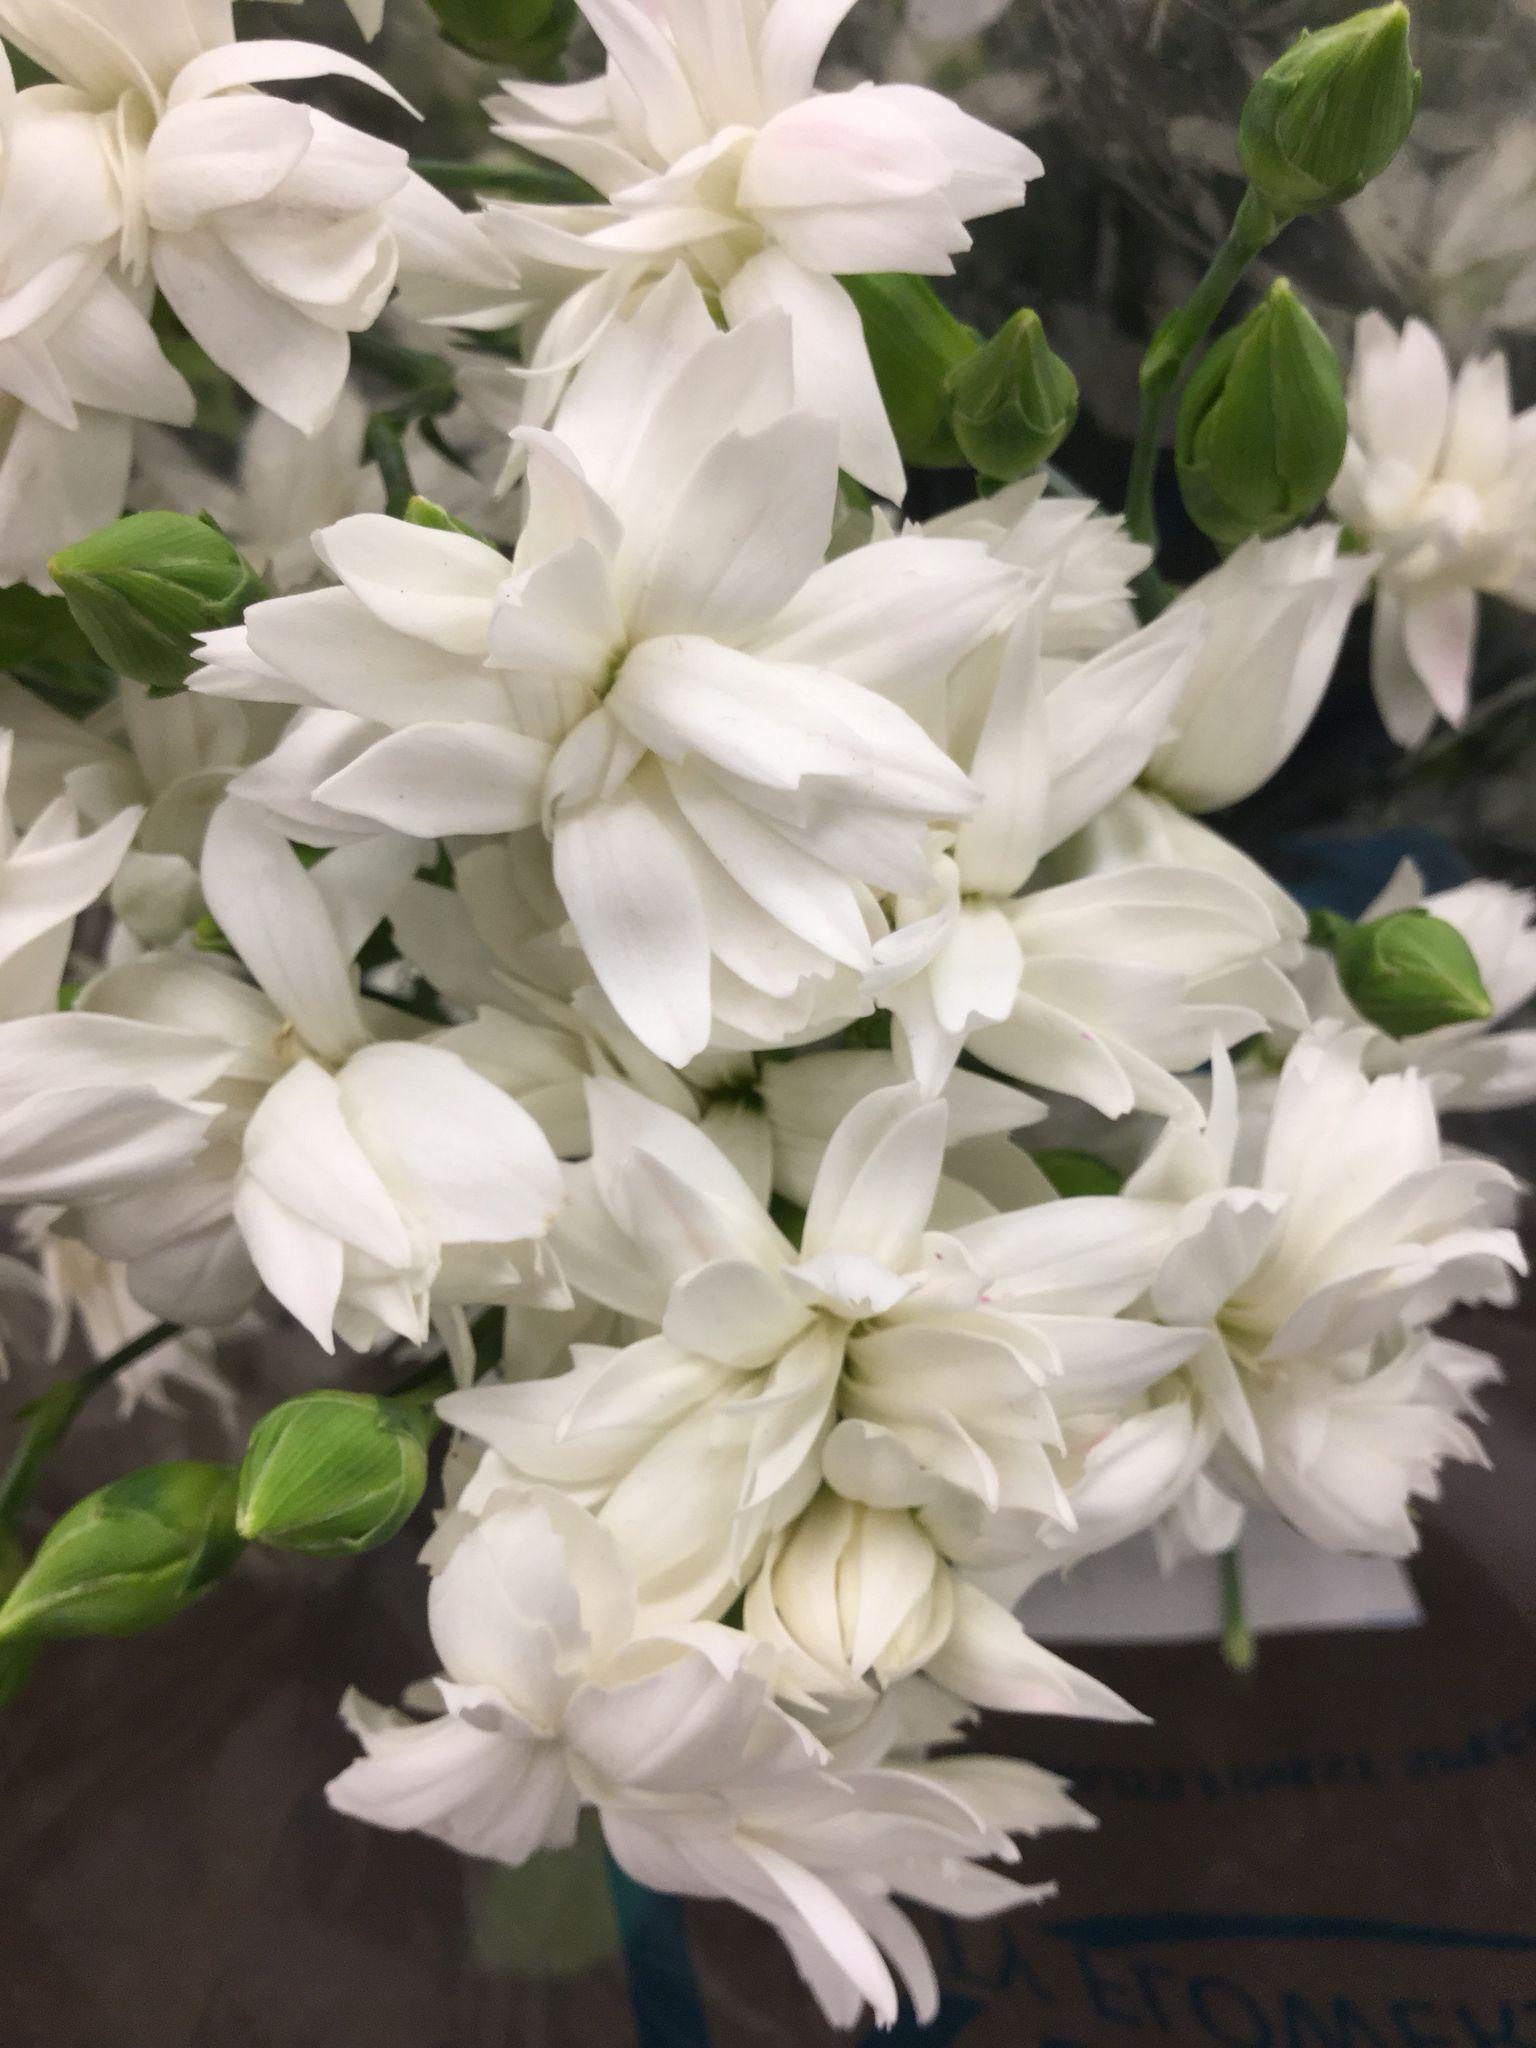 Japanese Mini Carnation Star Snow Mini Carnations Carnations White Carnation